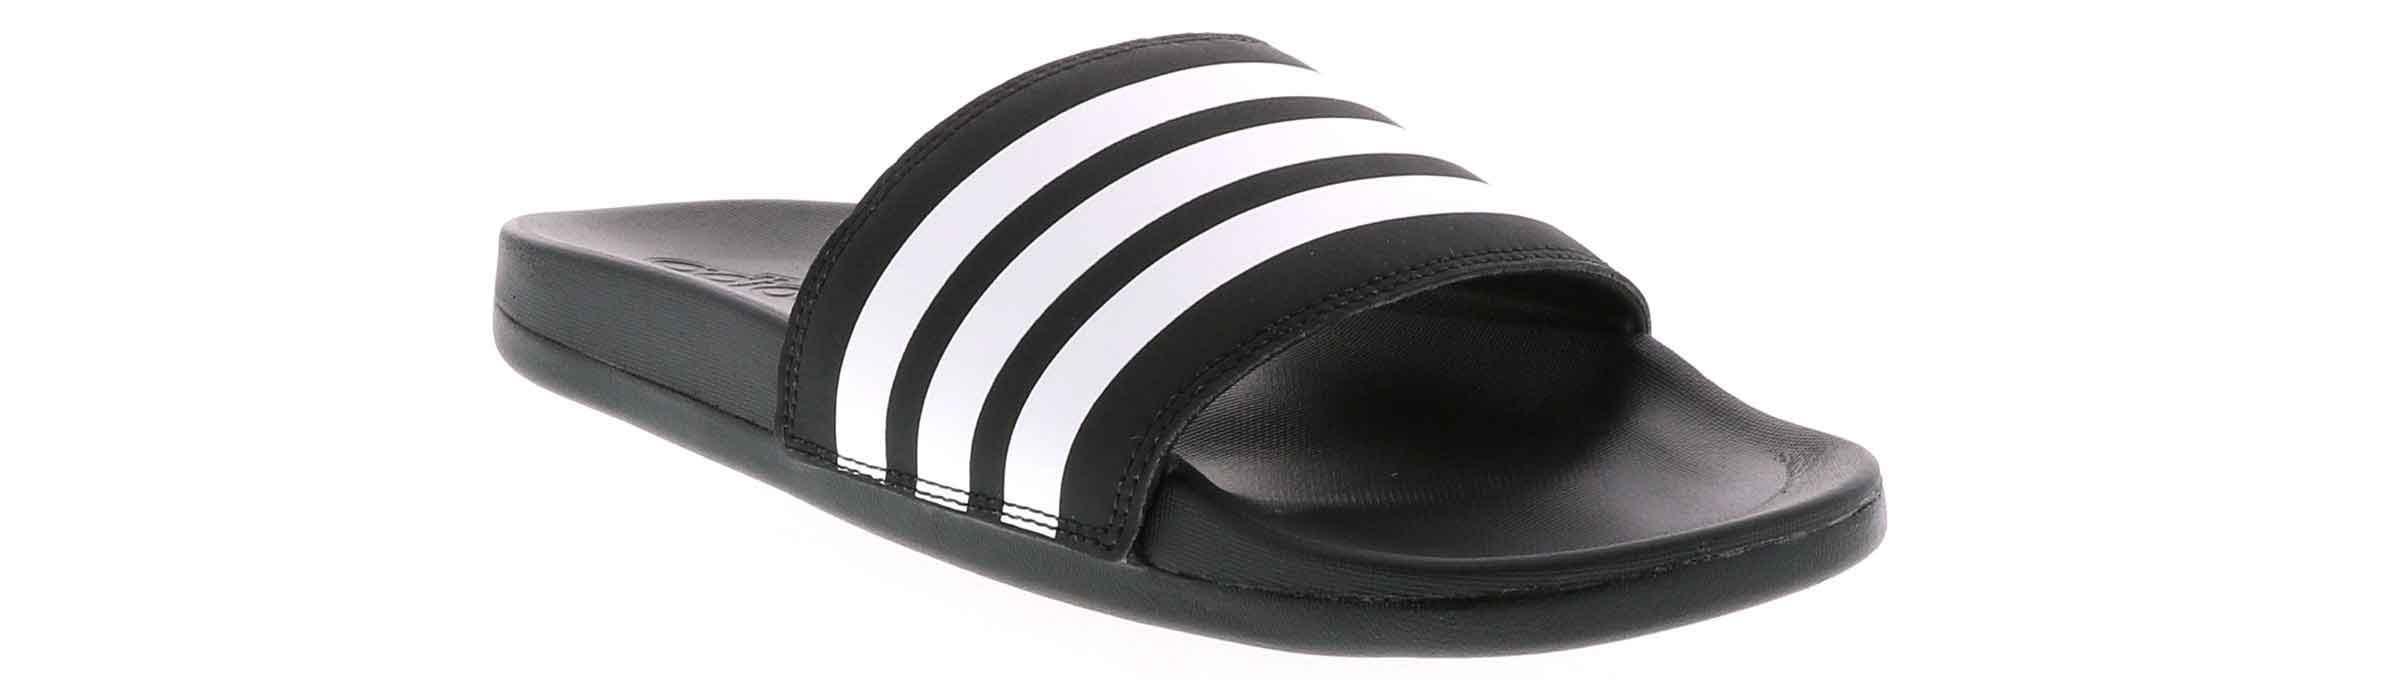 Women's Adidas Adilette Comfort Core